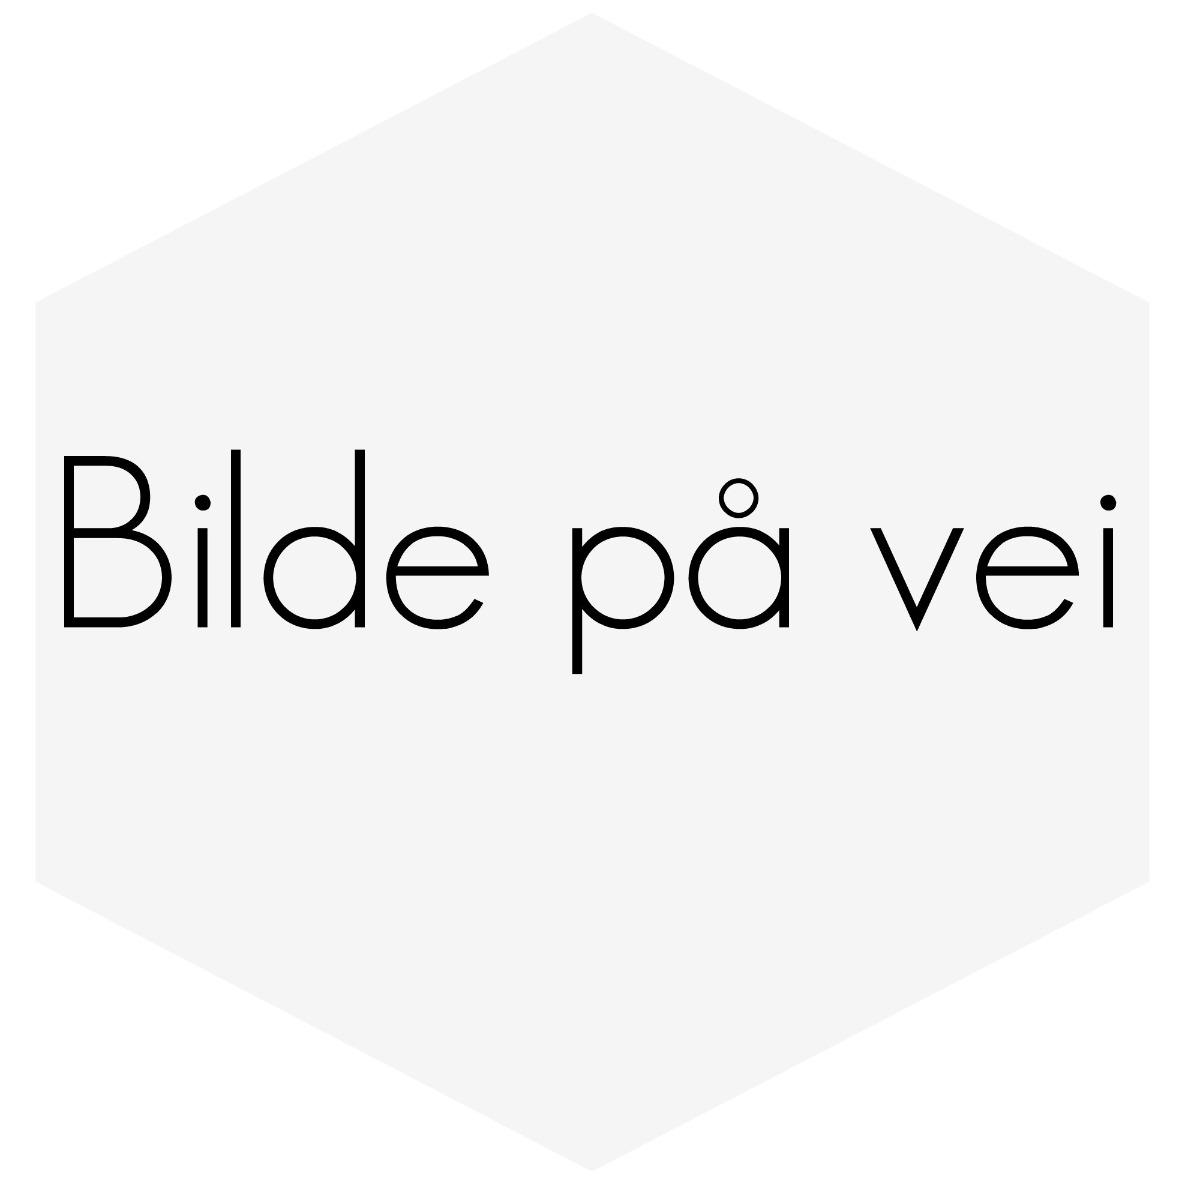 STØTDEMPER SPORT BILSTEIN B6 AMAZON FORAN pris stk